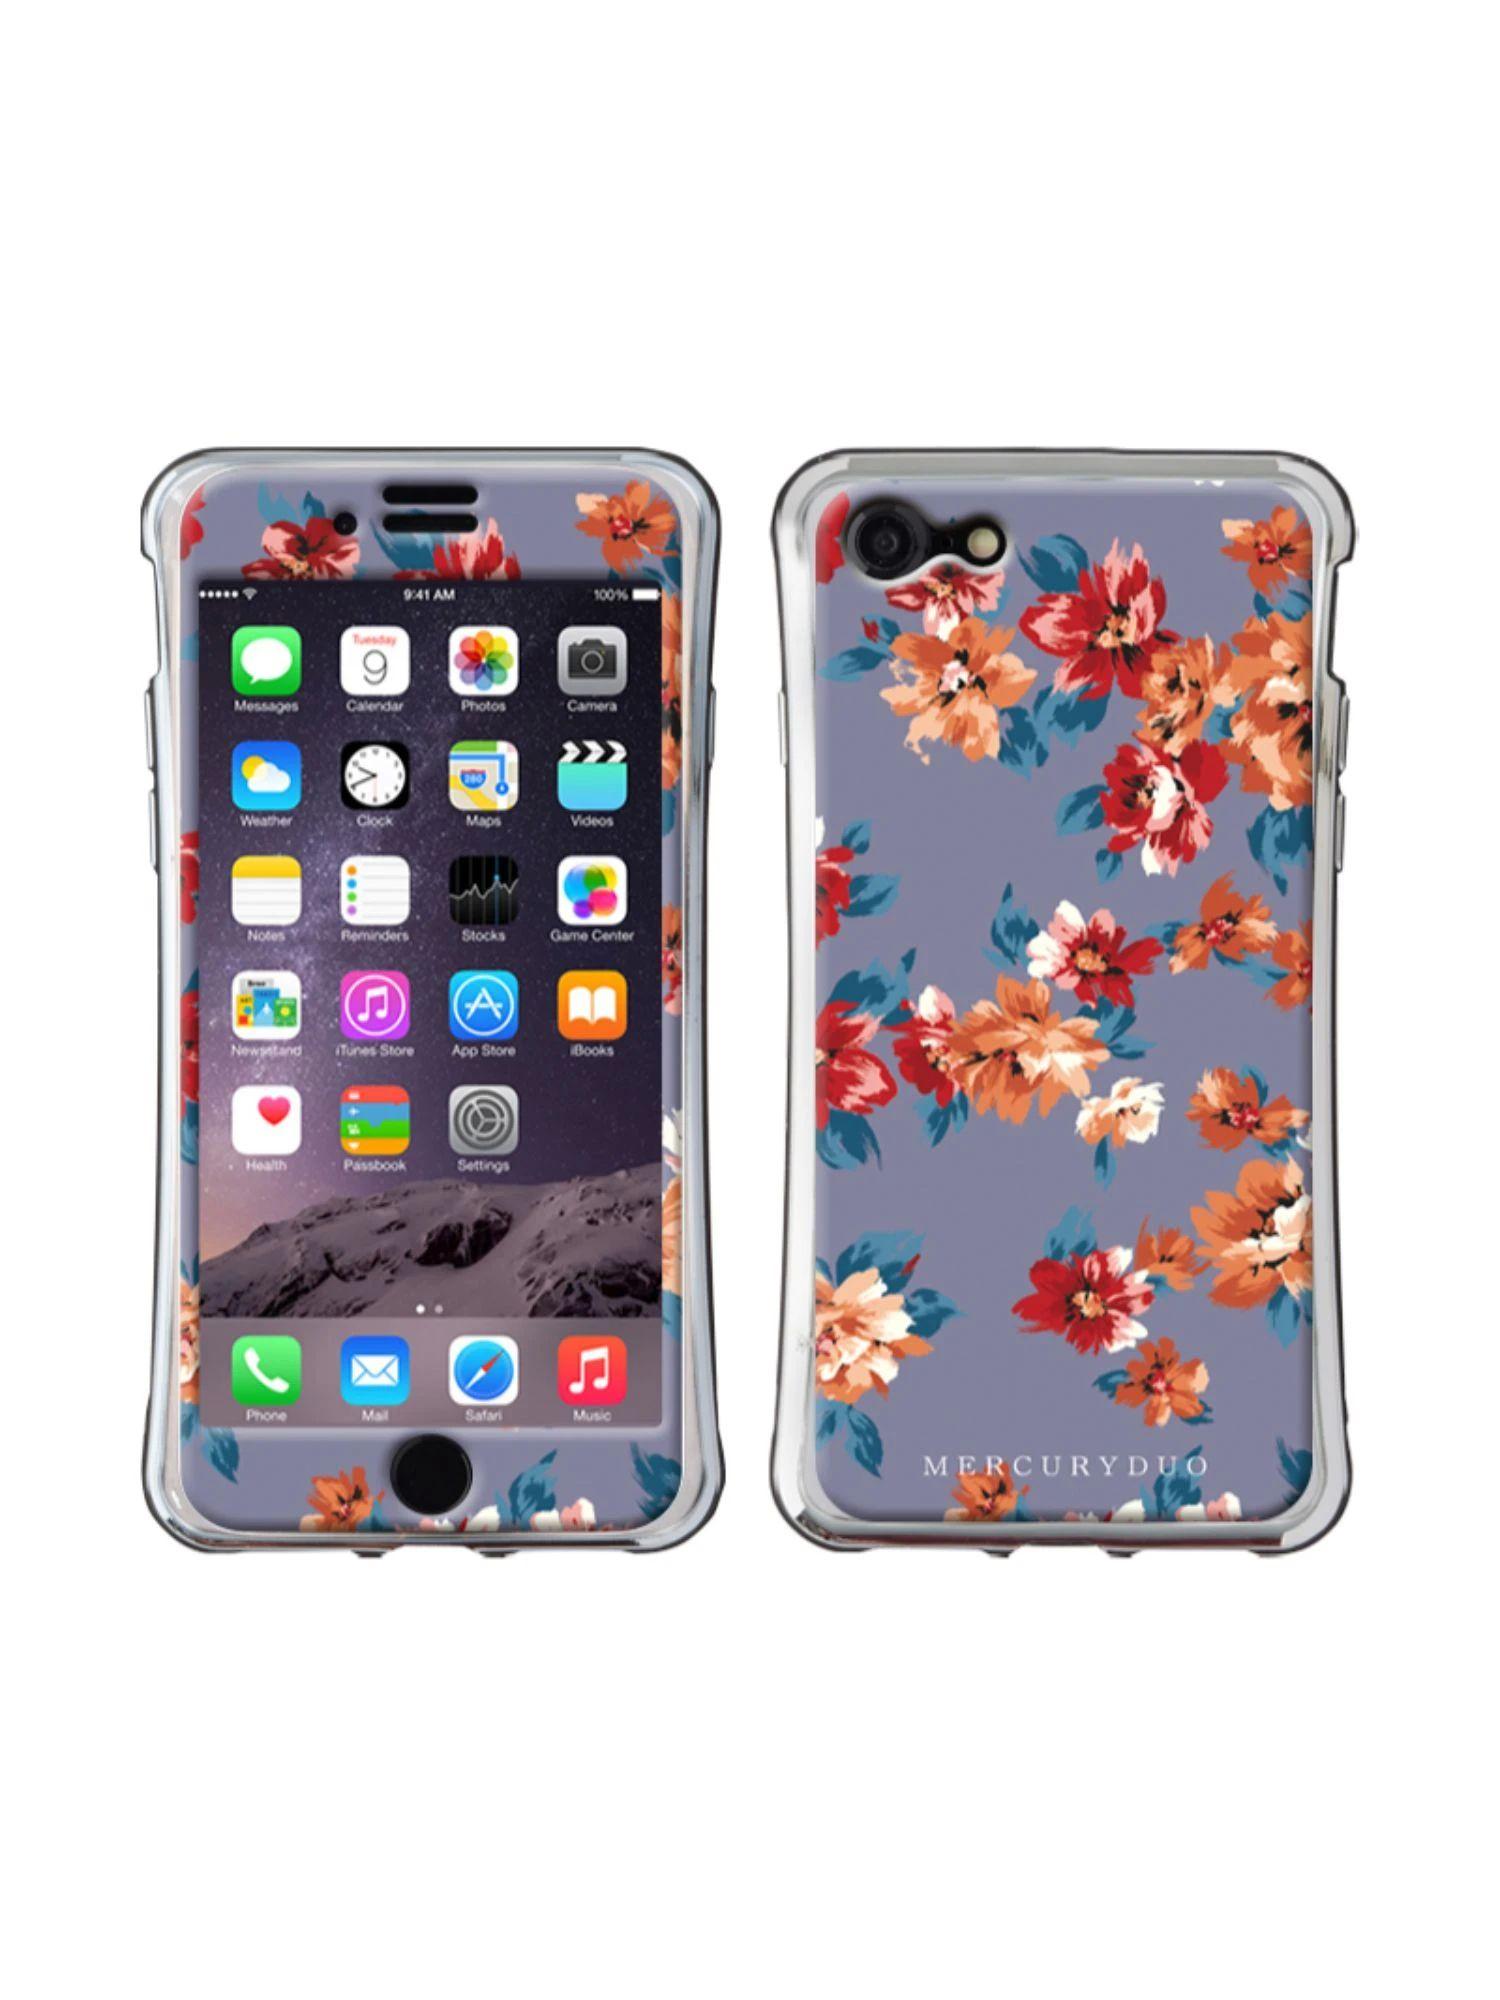 【MERCURYDUO】Middle flower iphone-7/8 スマホケース